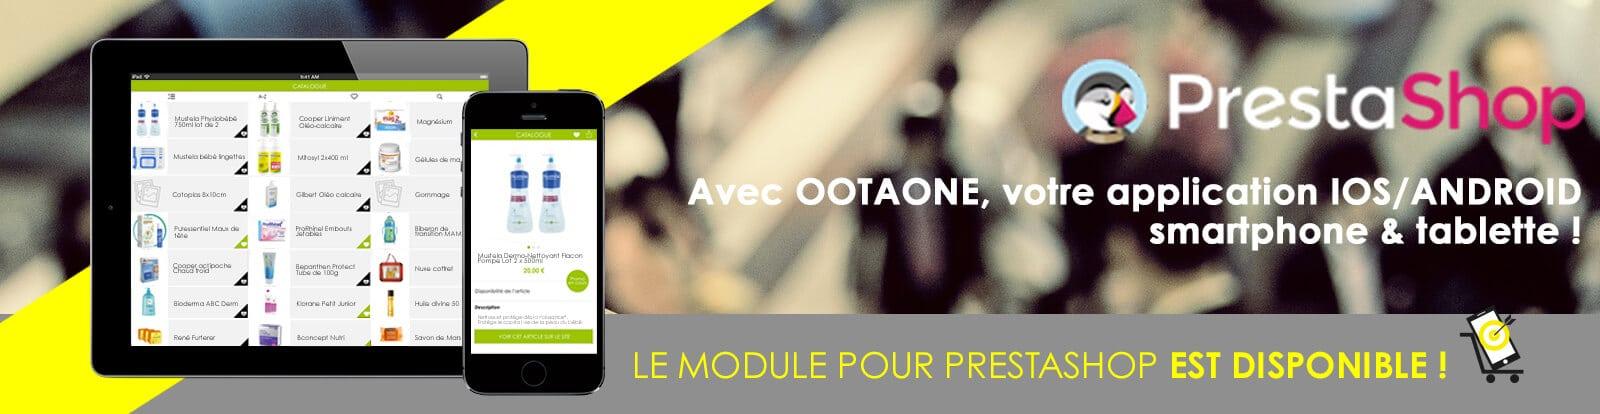 Ootaone m-commerce